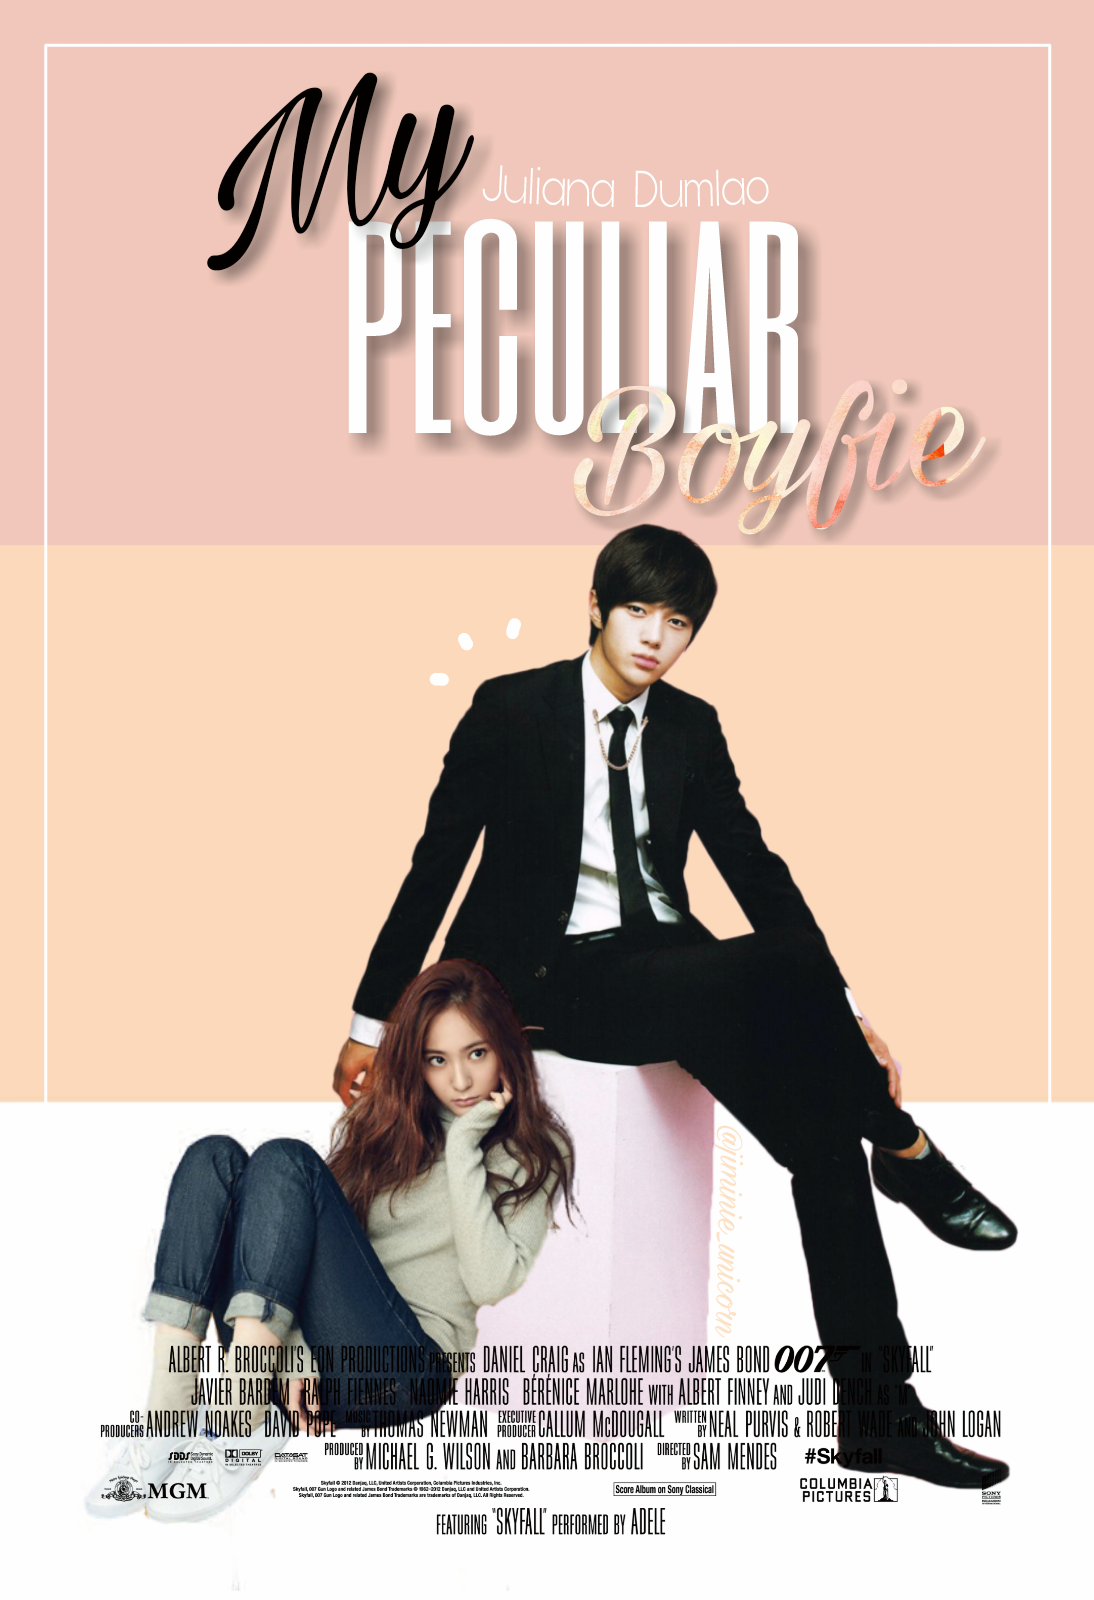 Kpop Book Cover Wattpad : Kimmyungsoo jungkrystal edit wattpad cover kpop fanfic